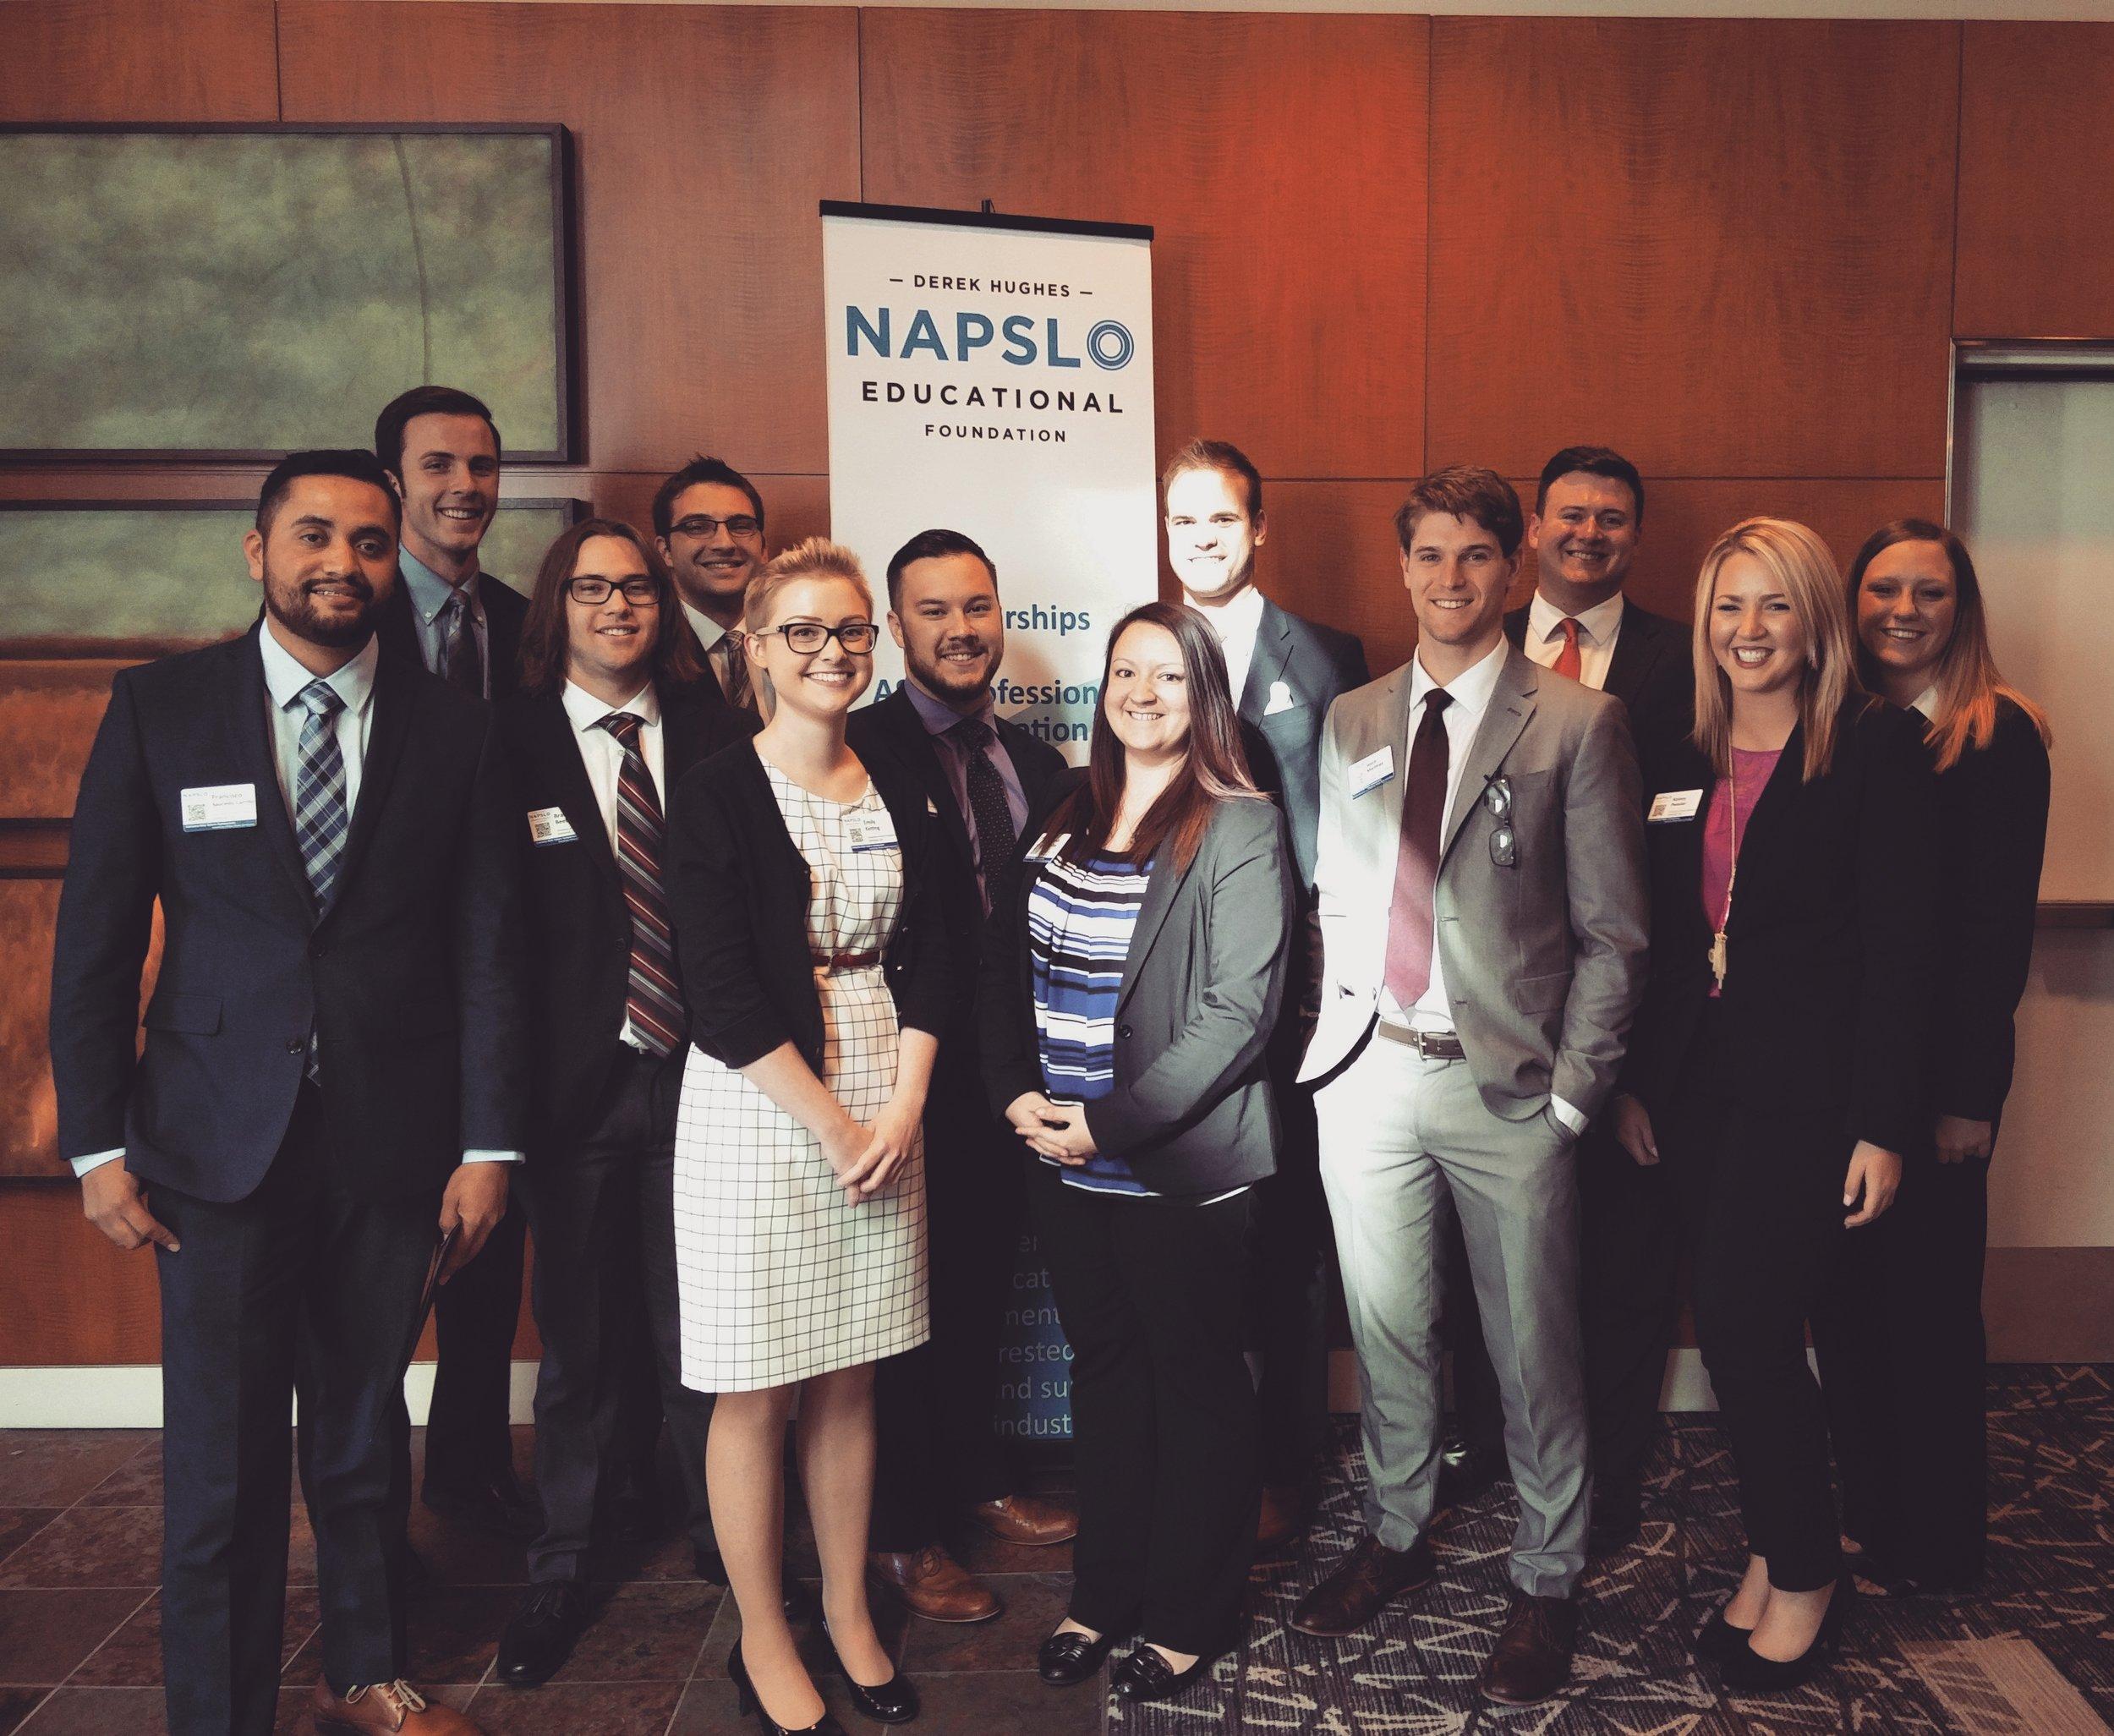 NAPSLO_Chicago2017_group.jpg